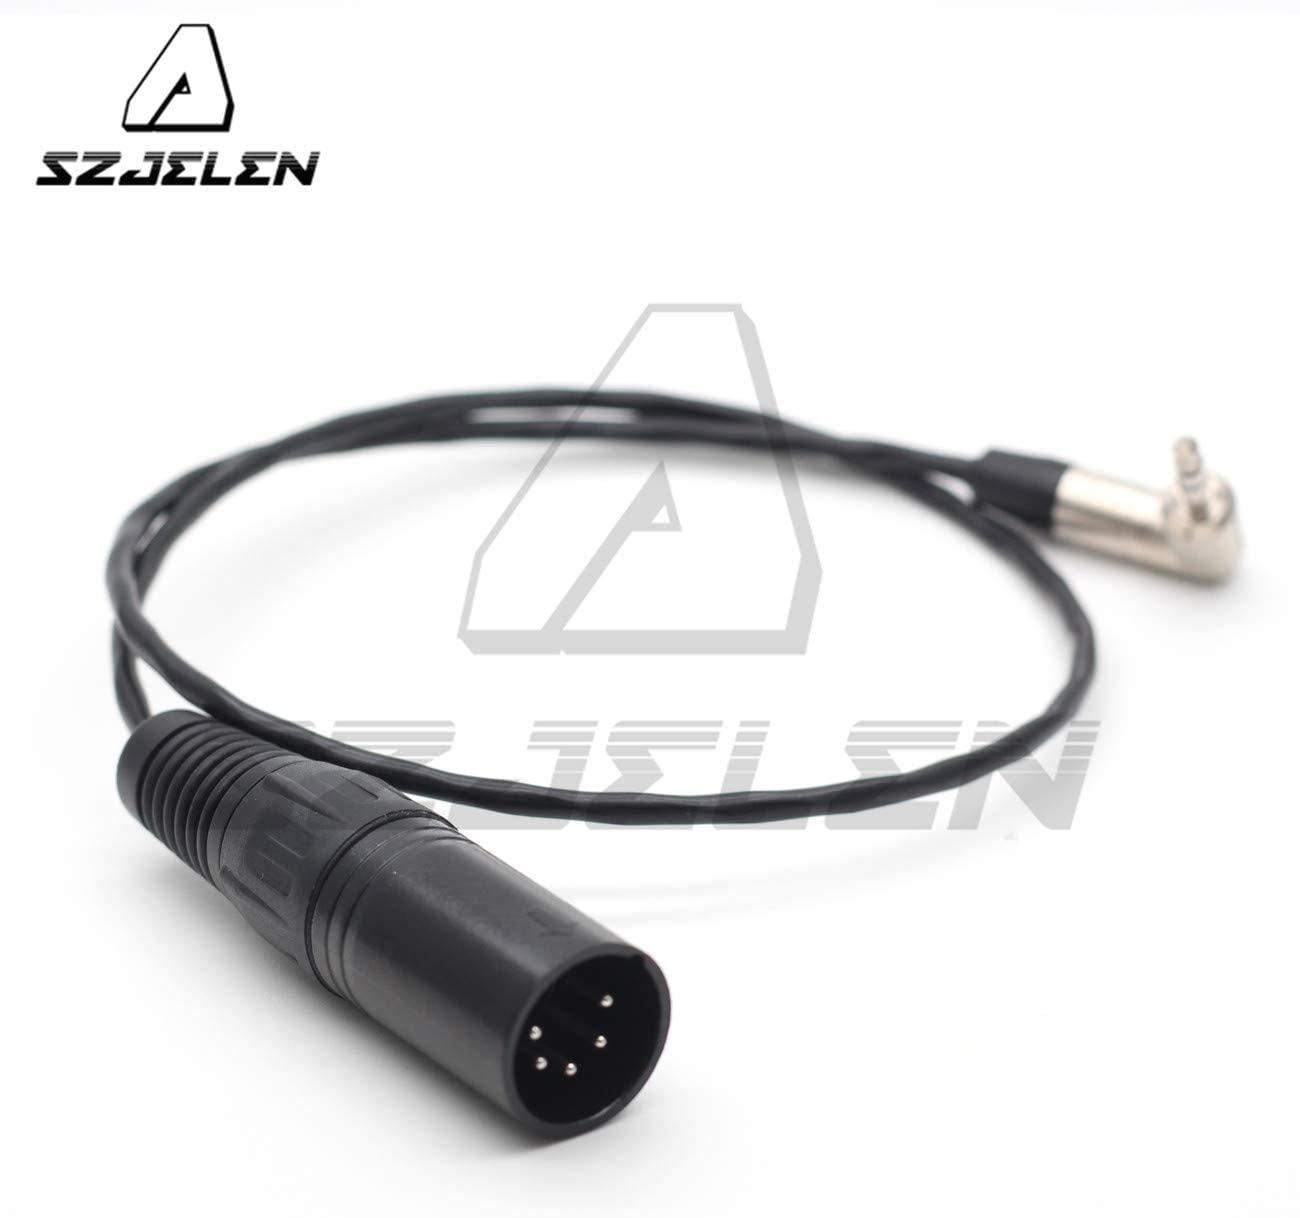 SZJELEN XLR 5pin Male to 3.5mm Audio Cable for Arri Alexa XT Audio Line (80CM)